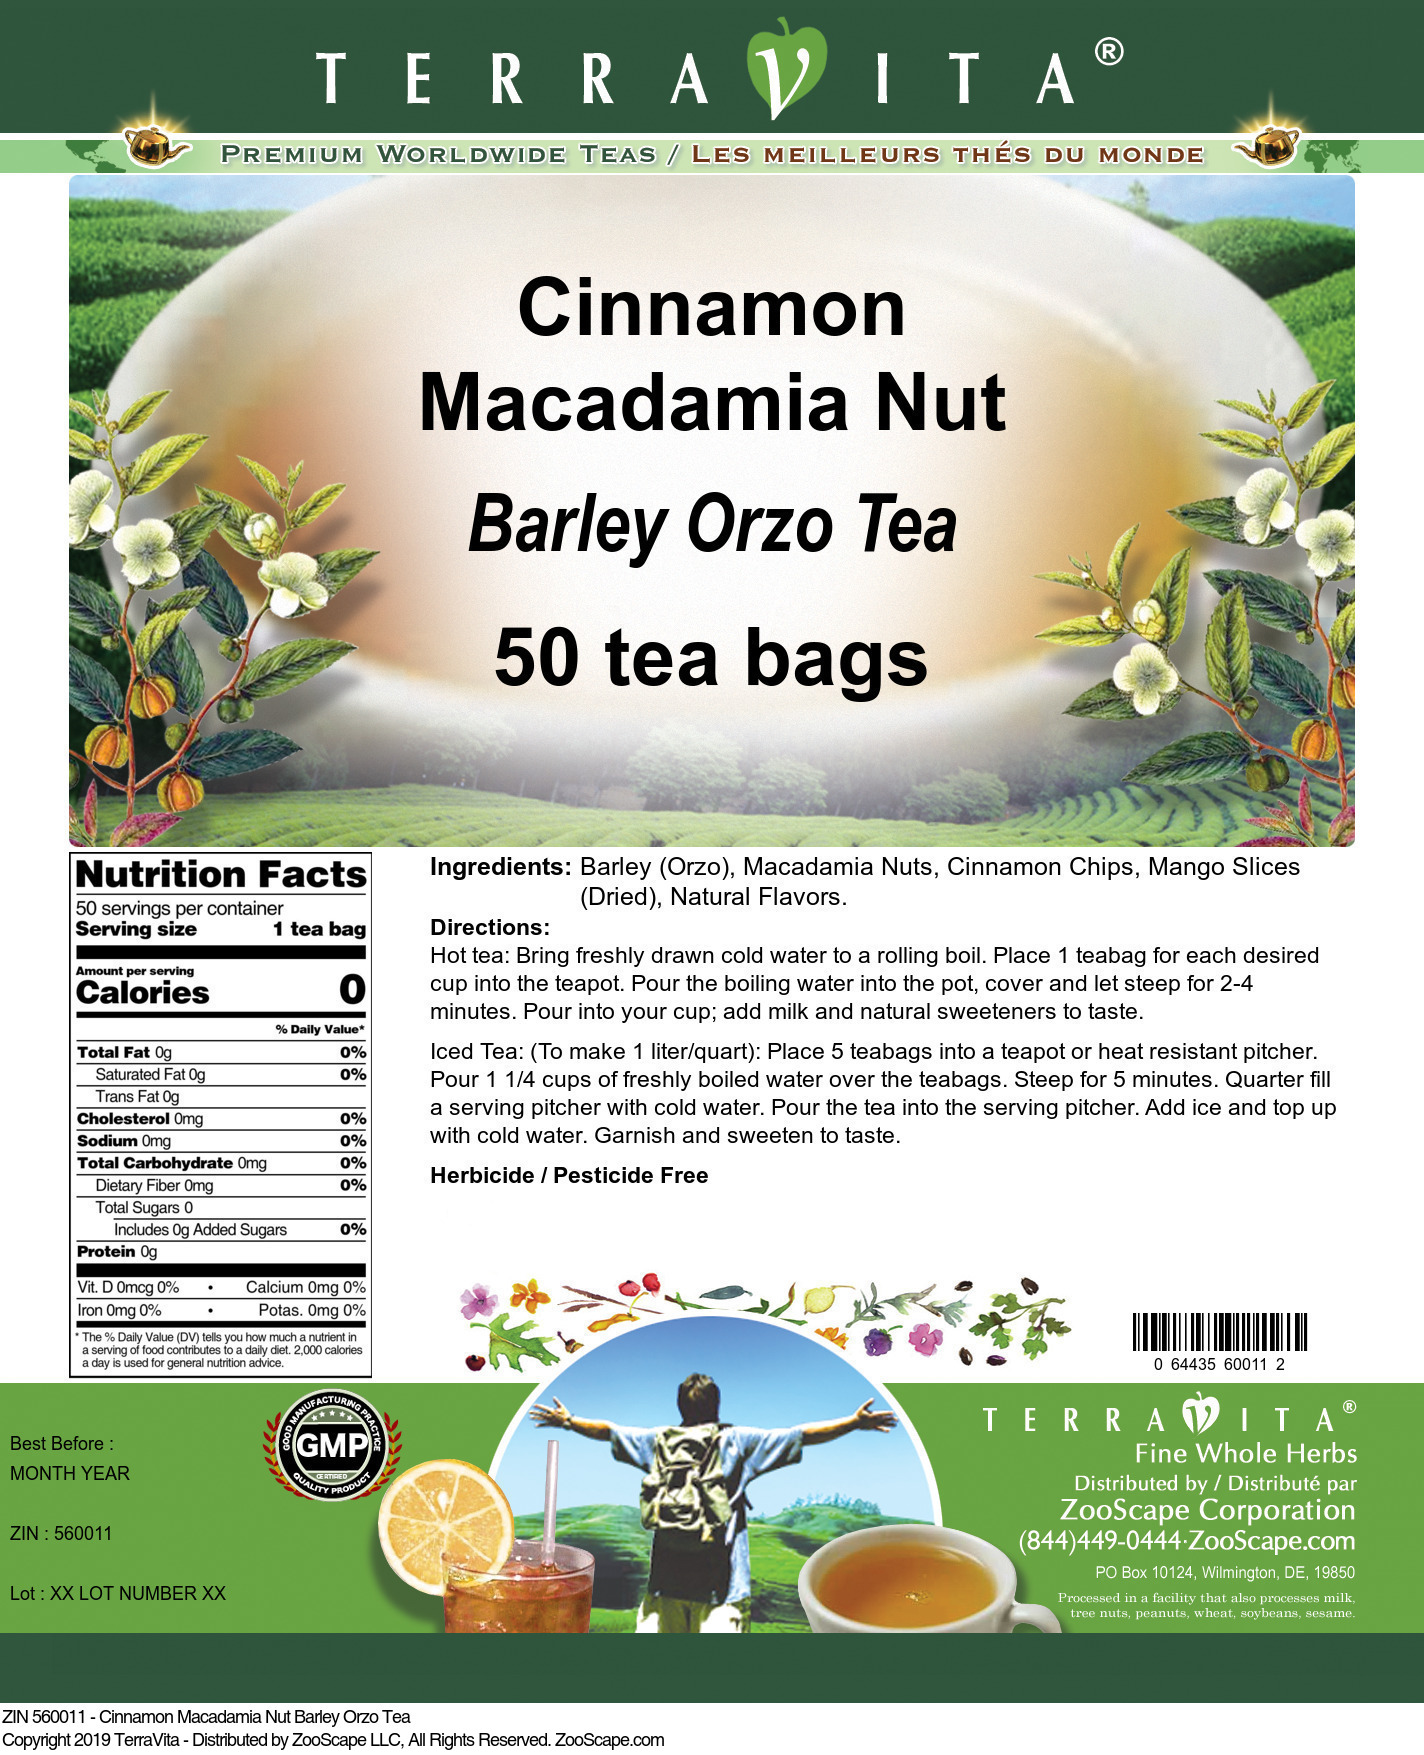 Cinnamon Macadamia Nut Barley Orzo